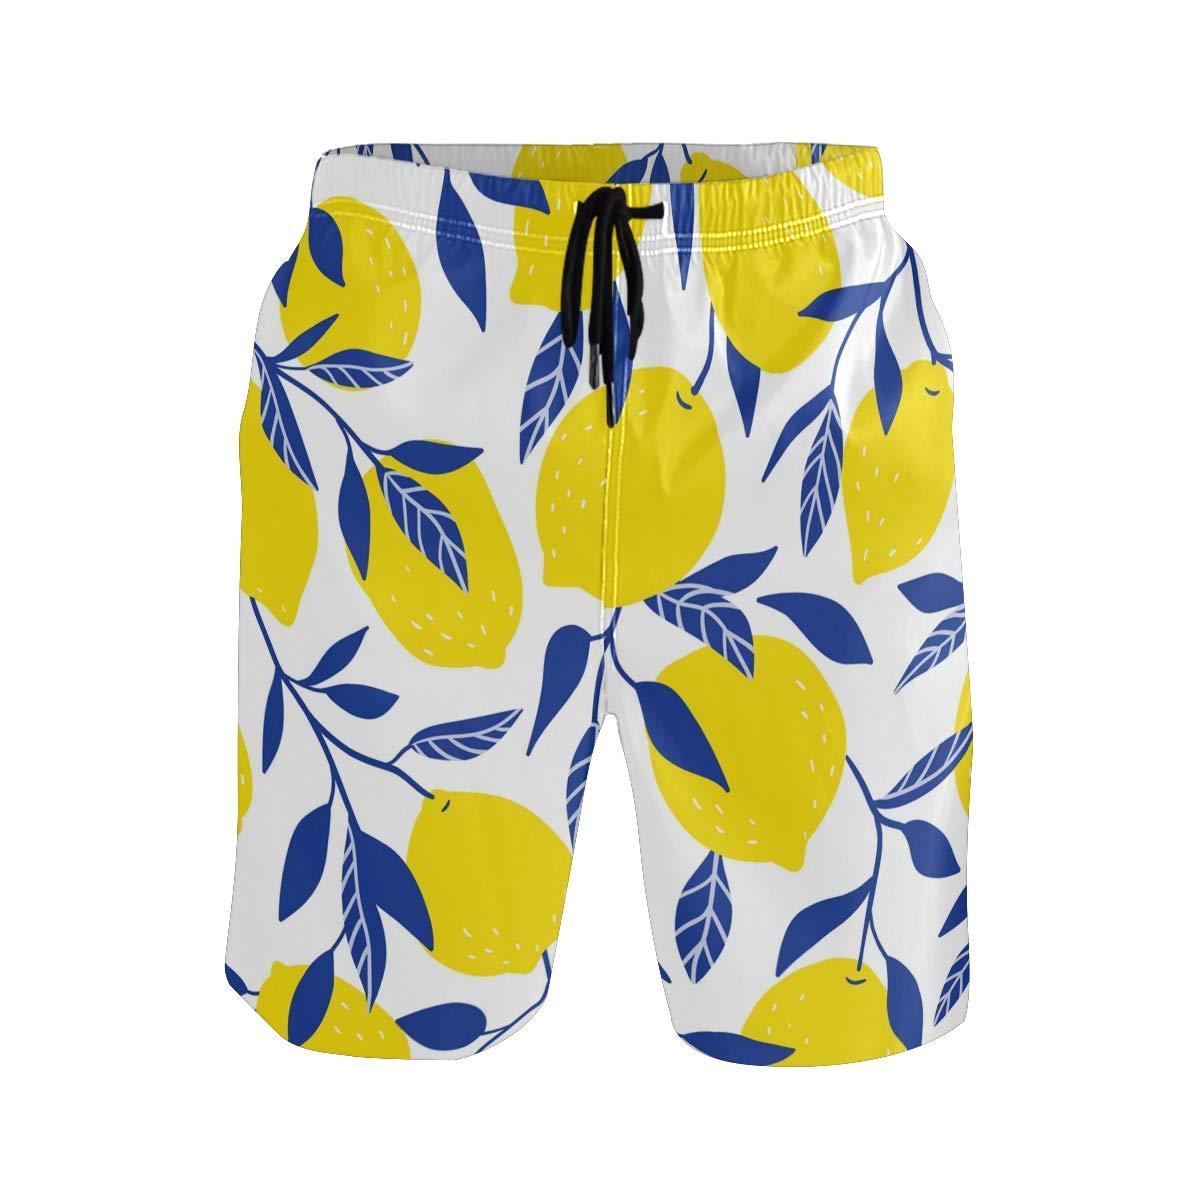 CENHOME Mens Swim Trunks Yellow Lemon Blue Leaves Pattern Beach Board Shorts